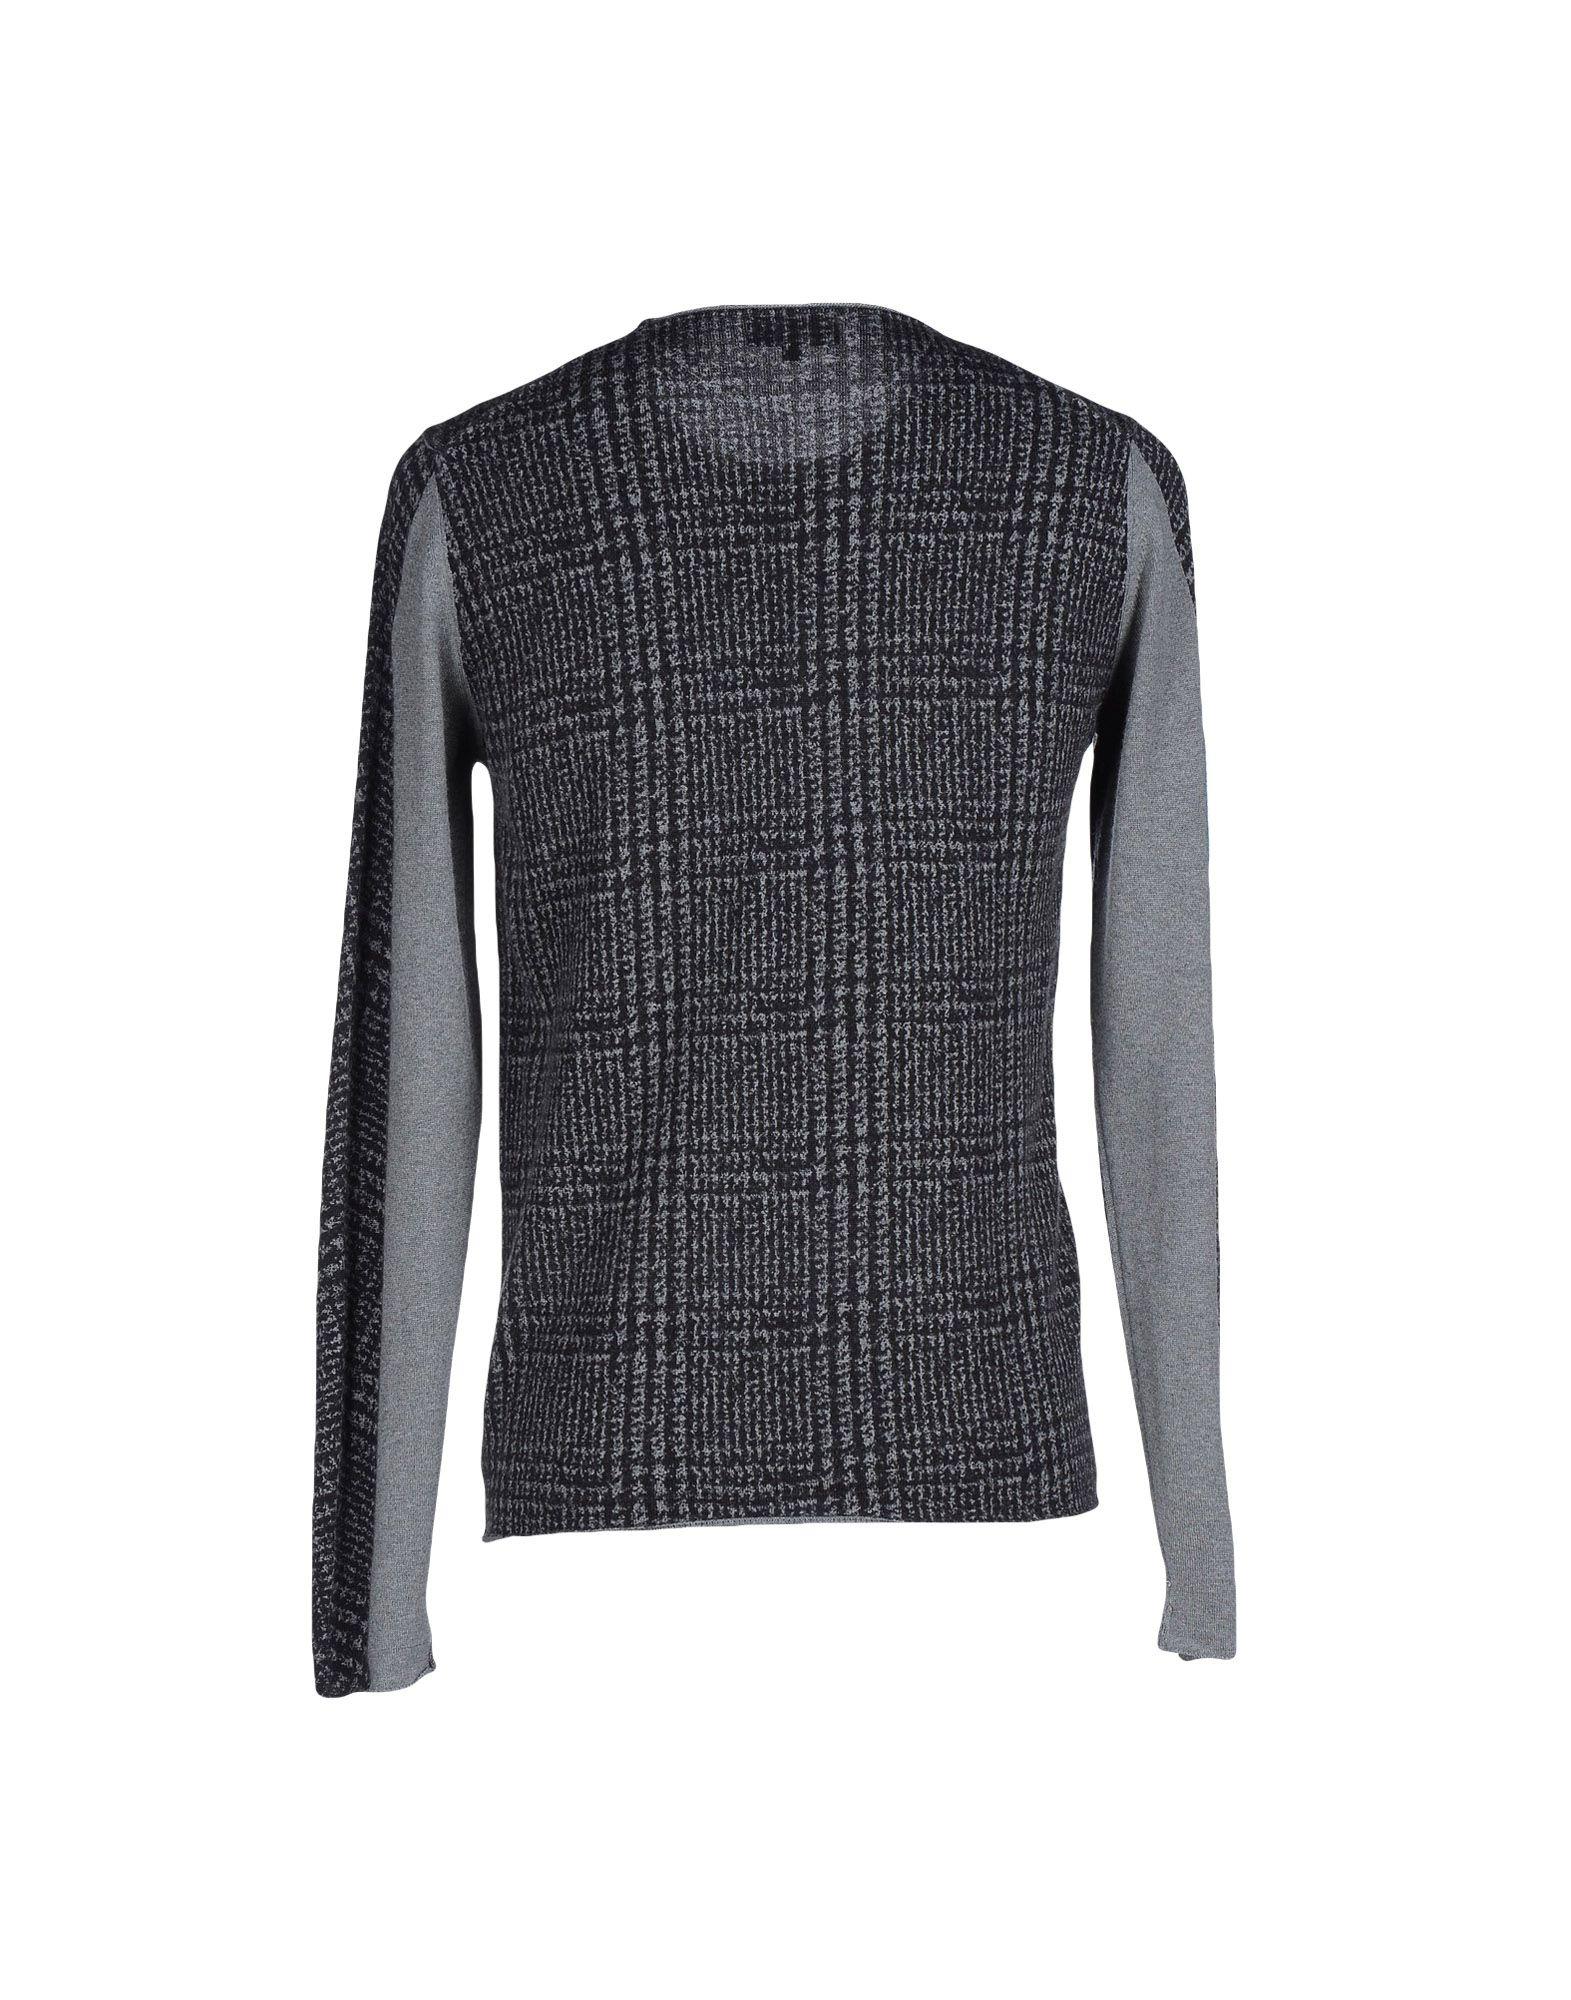 lyst emporio armani jumper in gray for men. Black Bedroom Furniture Sets. Home Design Ideas